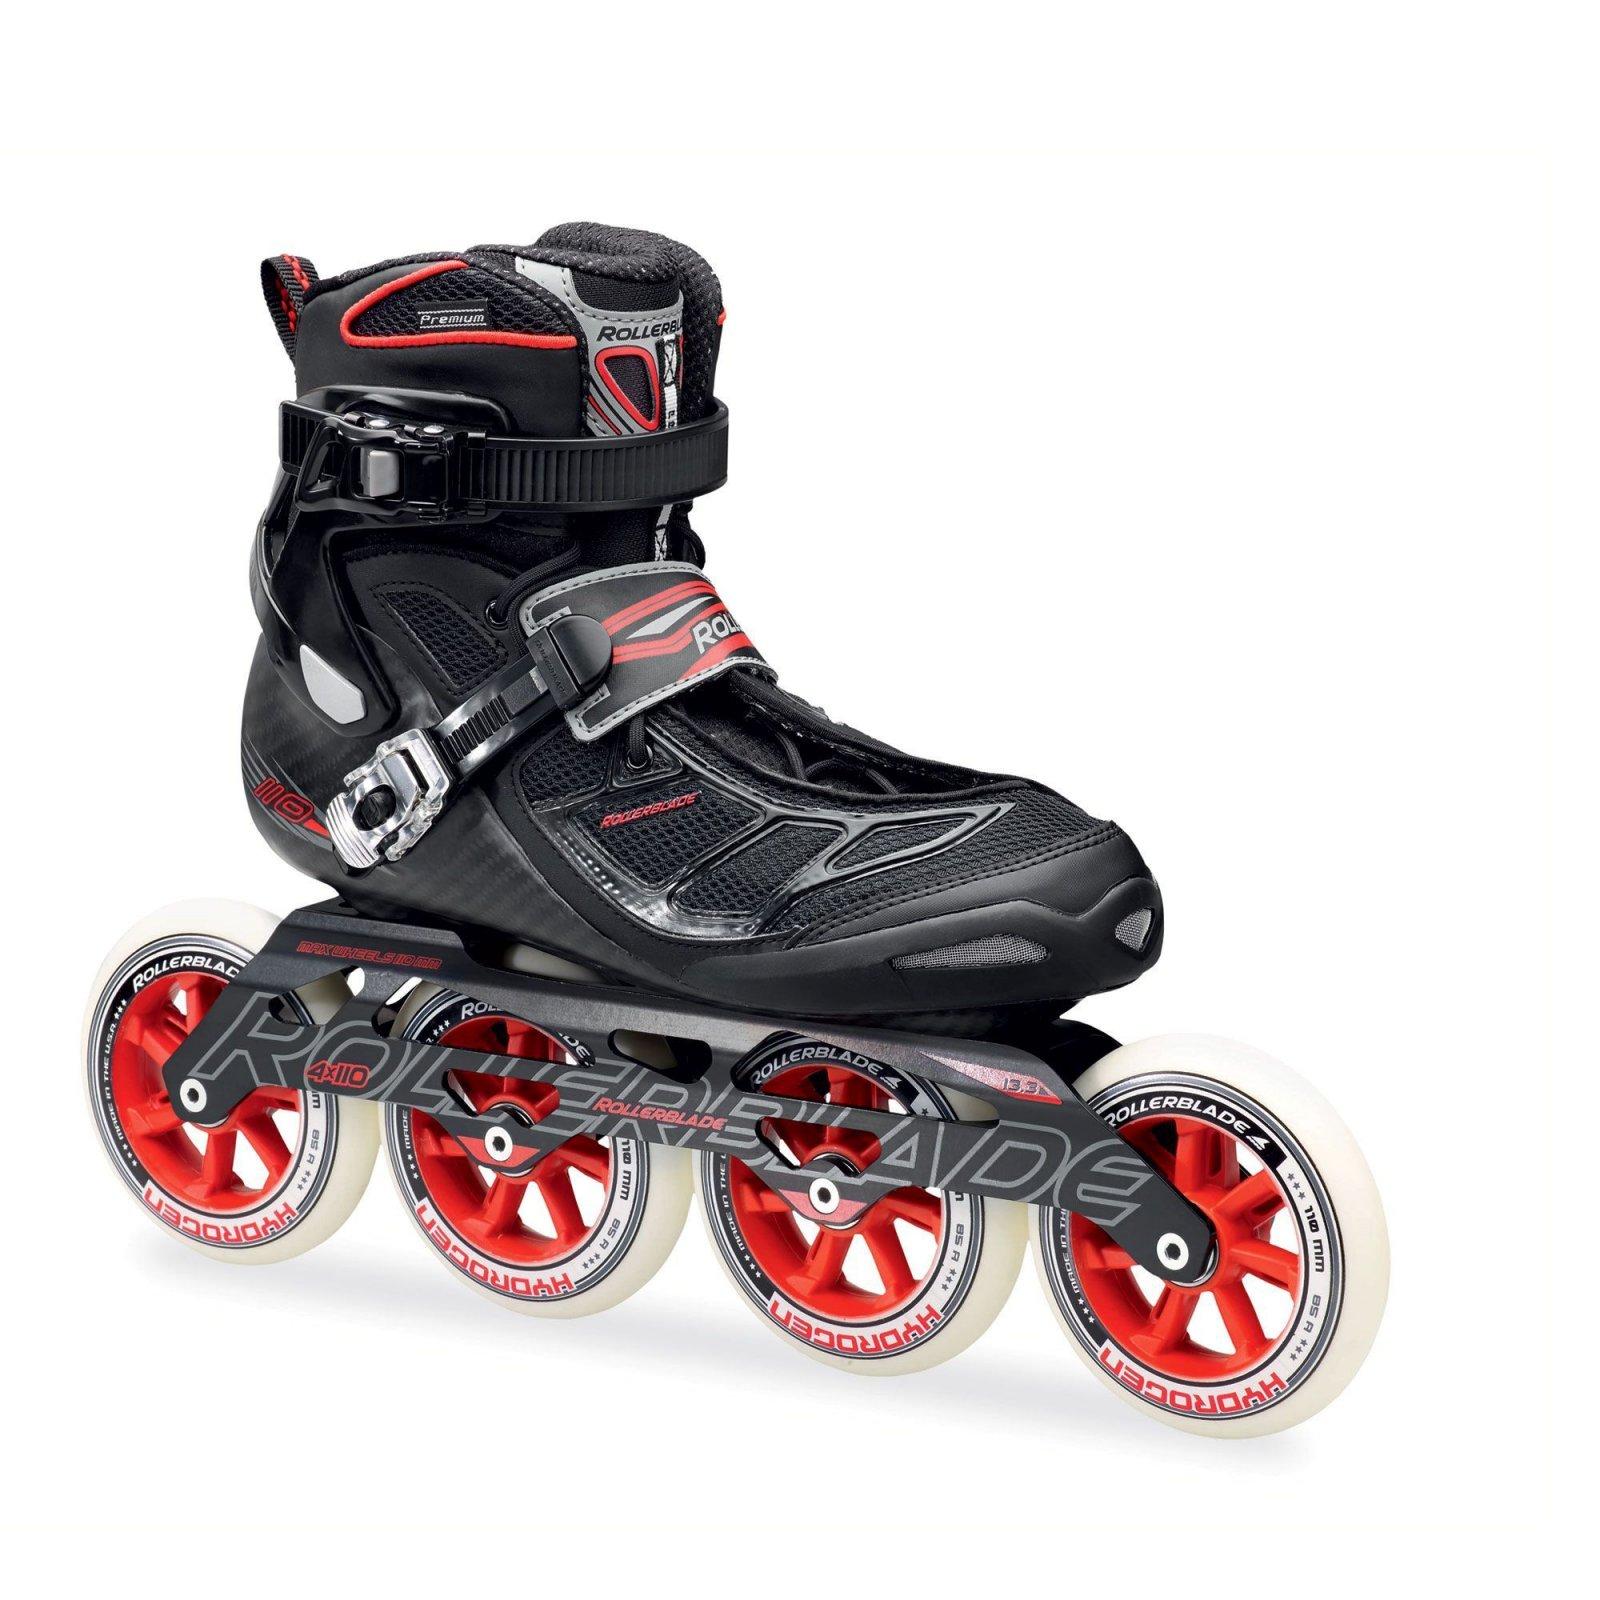 2017 Rollerblade Tempest 110 C Men's Inline Skates